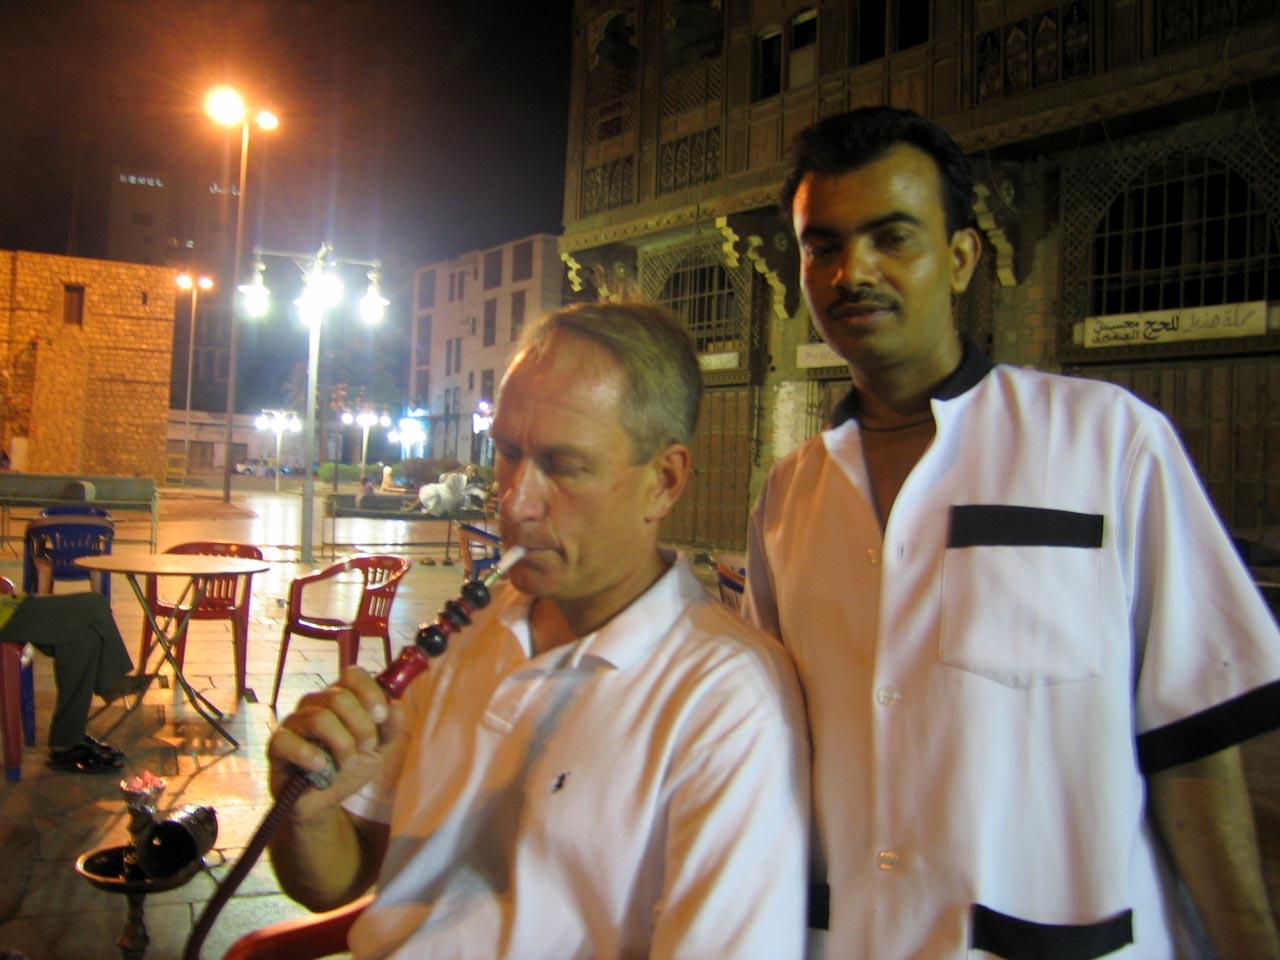 Smoking a hookah pipe in the plaza. © Mark Lowey